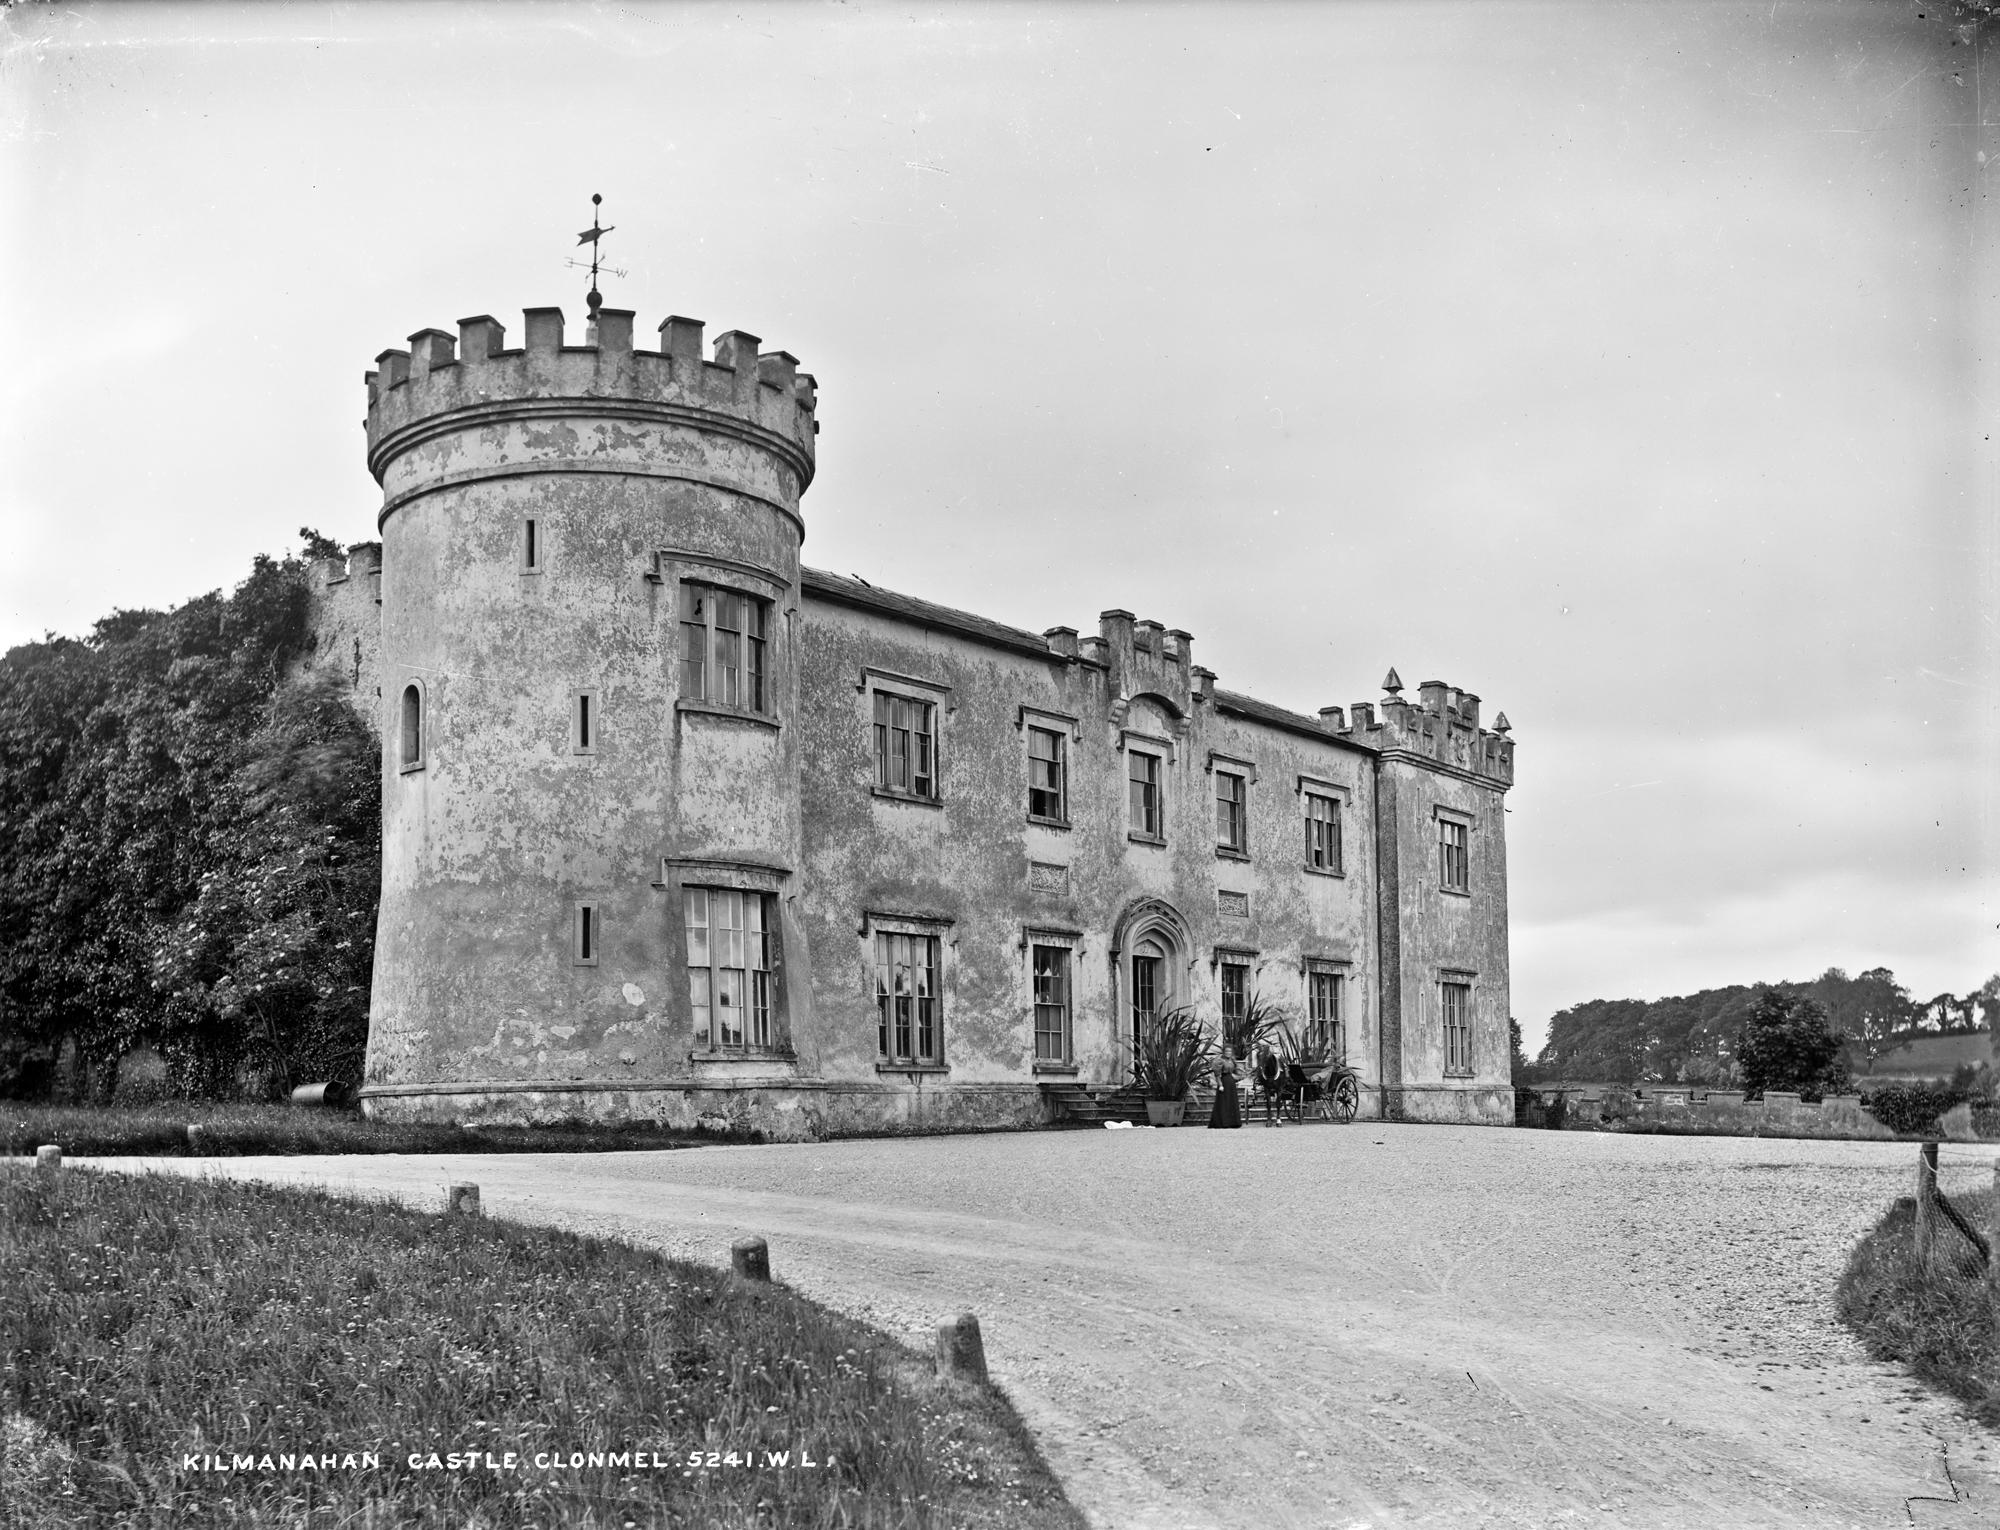 Kilmanahan Castle, Clonmel, Co. Tipperary